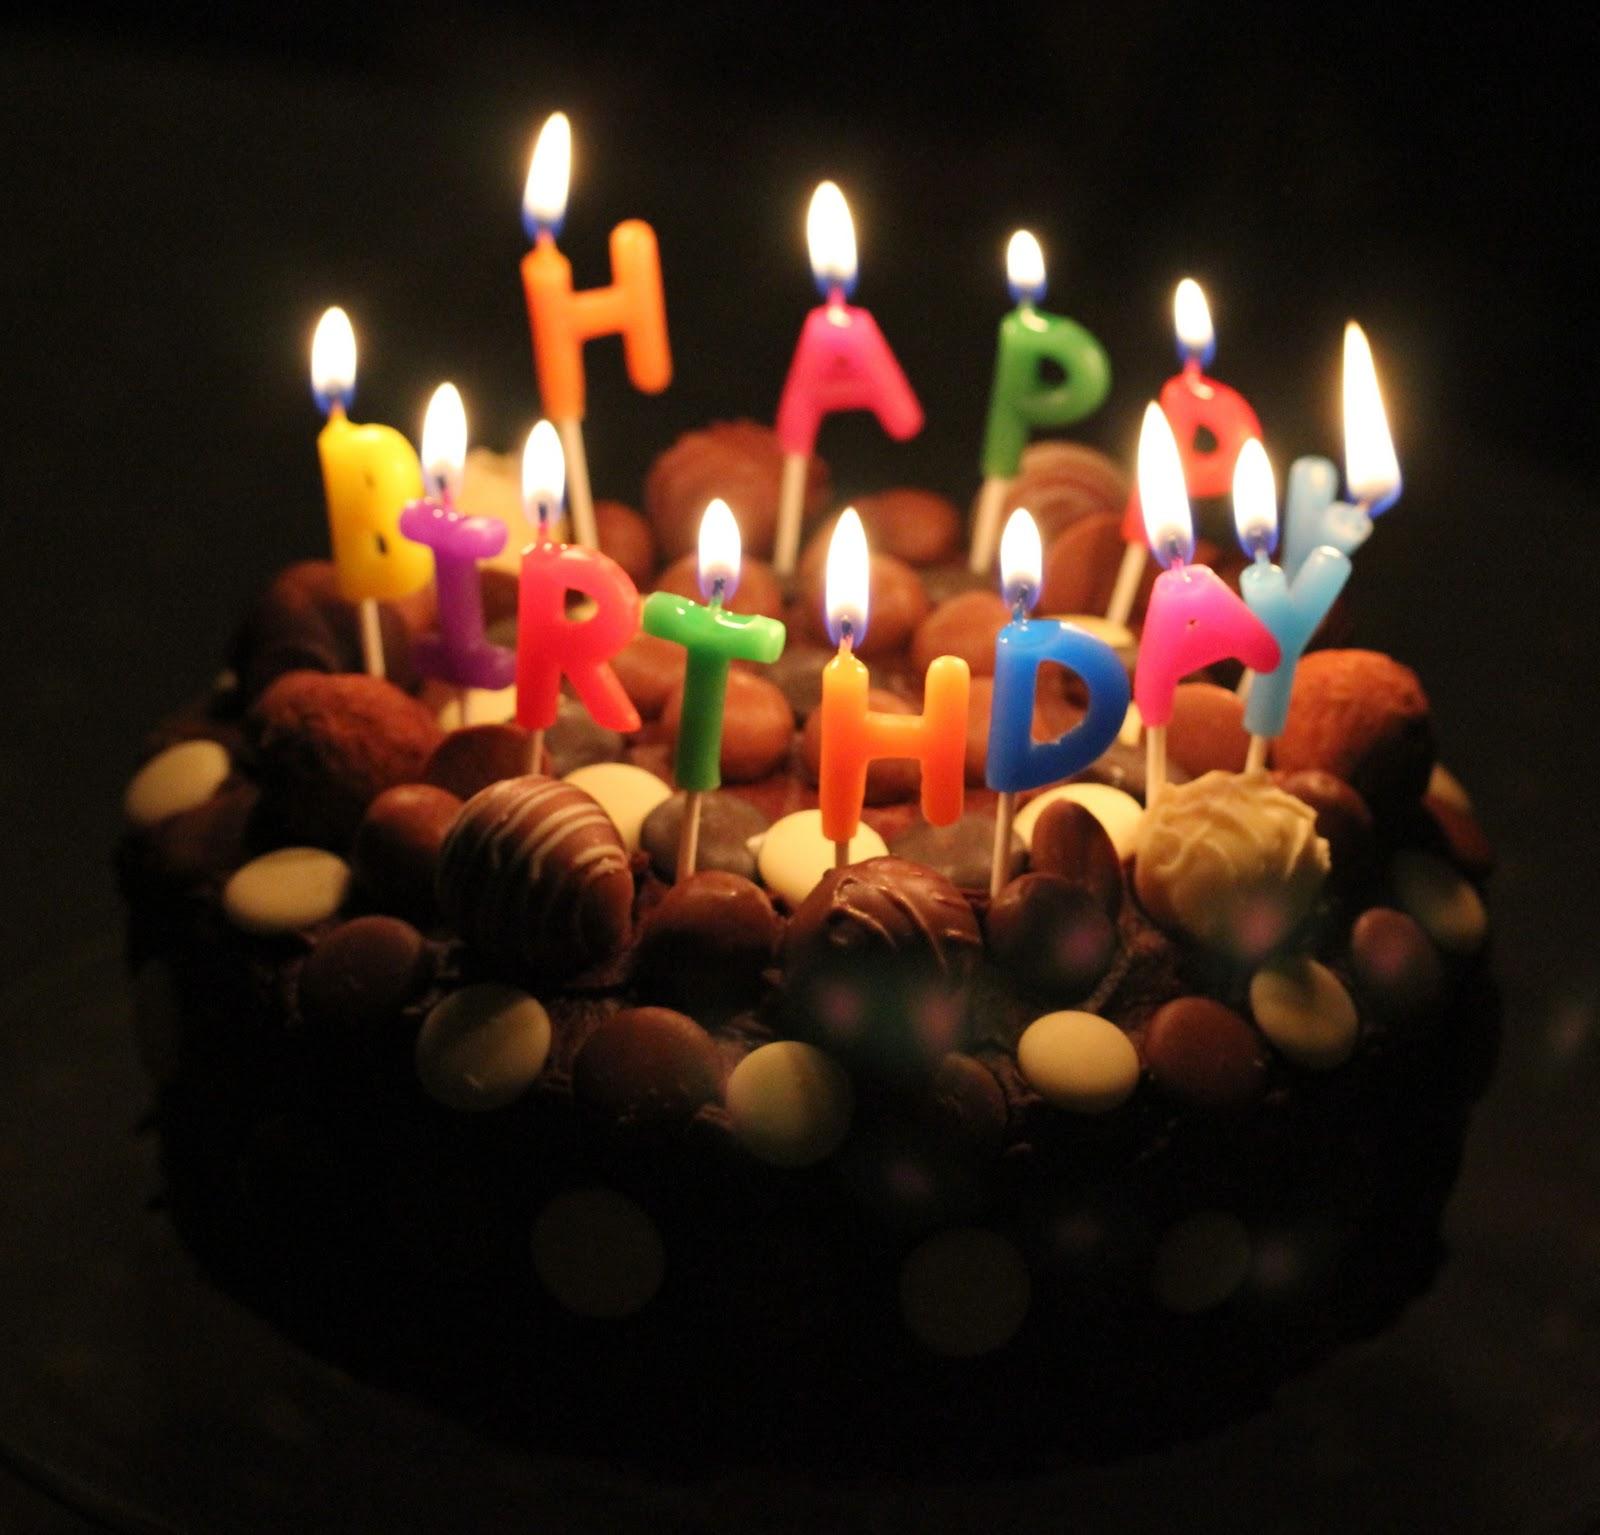 Happy Birthday Cake Happy Birthday Cake Hd Image 22634